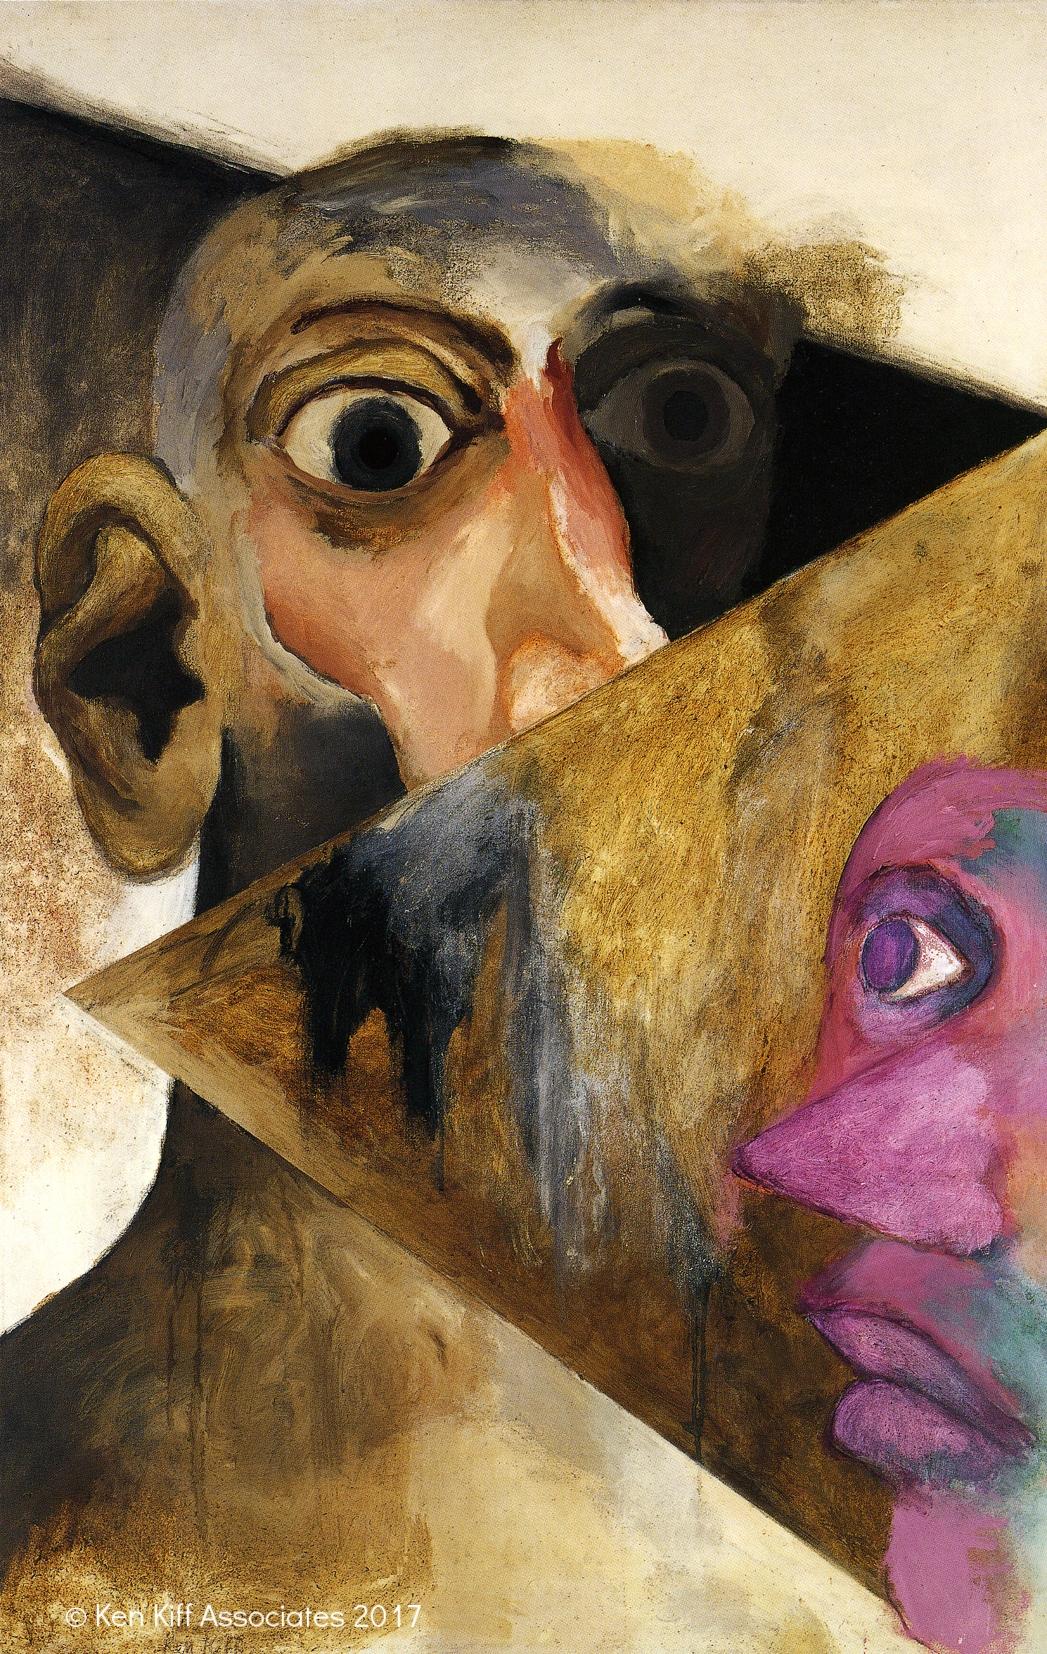 Ken Kiff - Two Faces